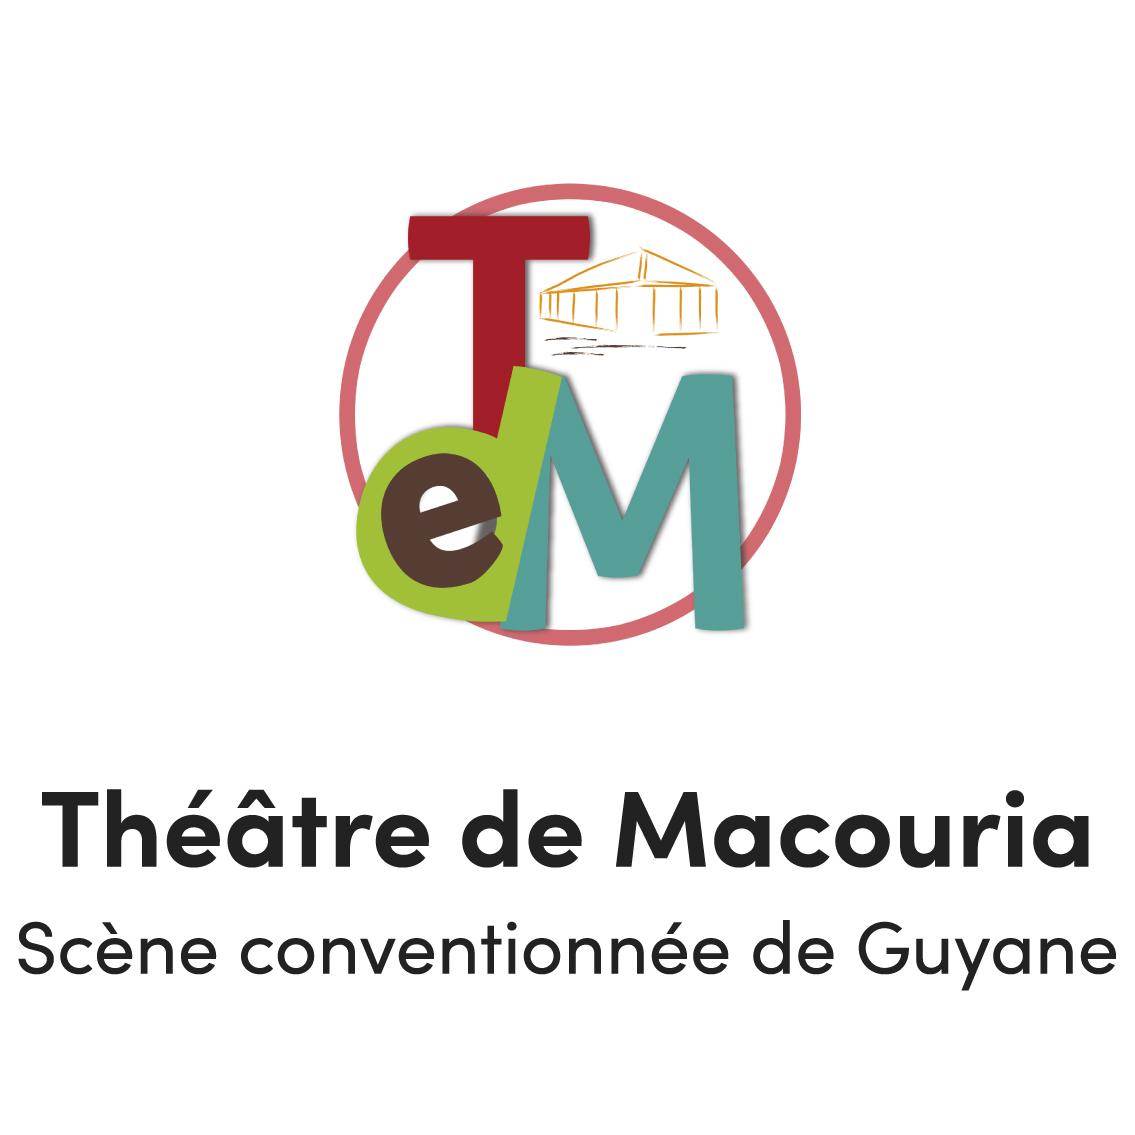 Théâtre de Macouria